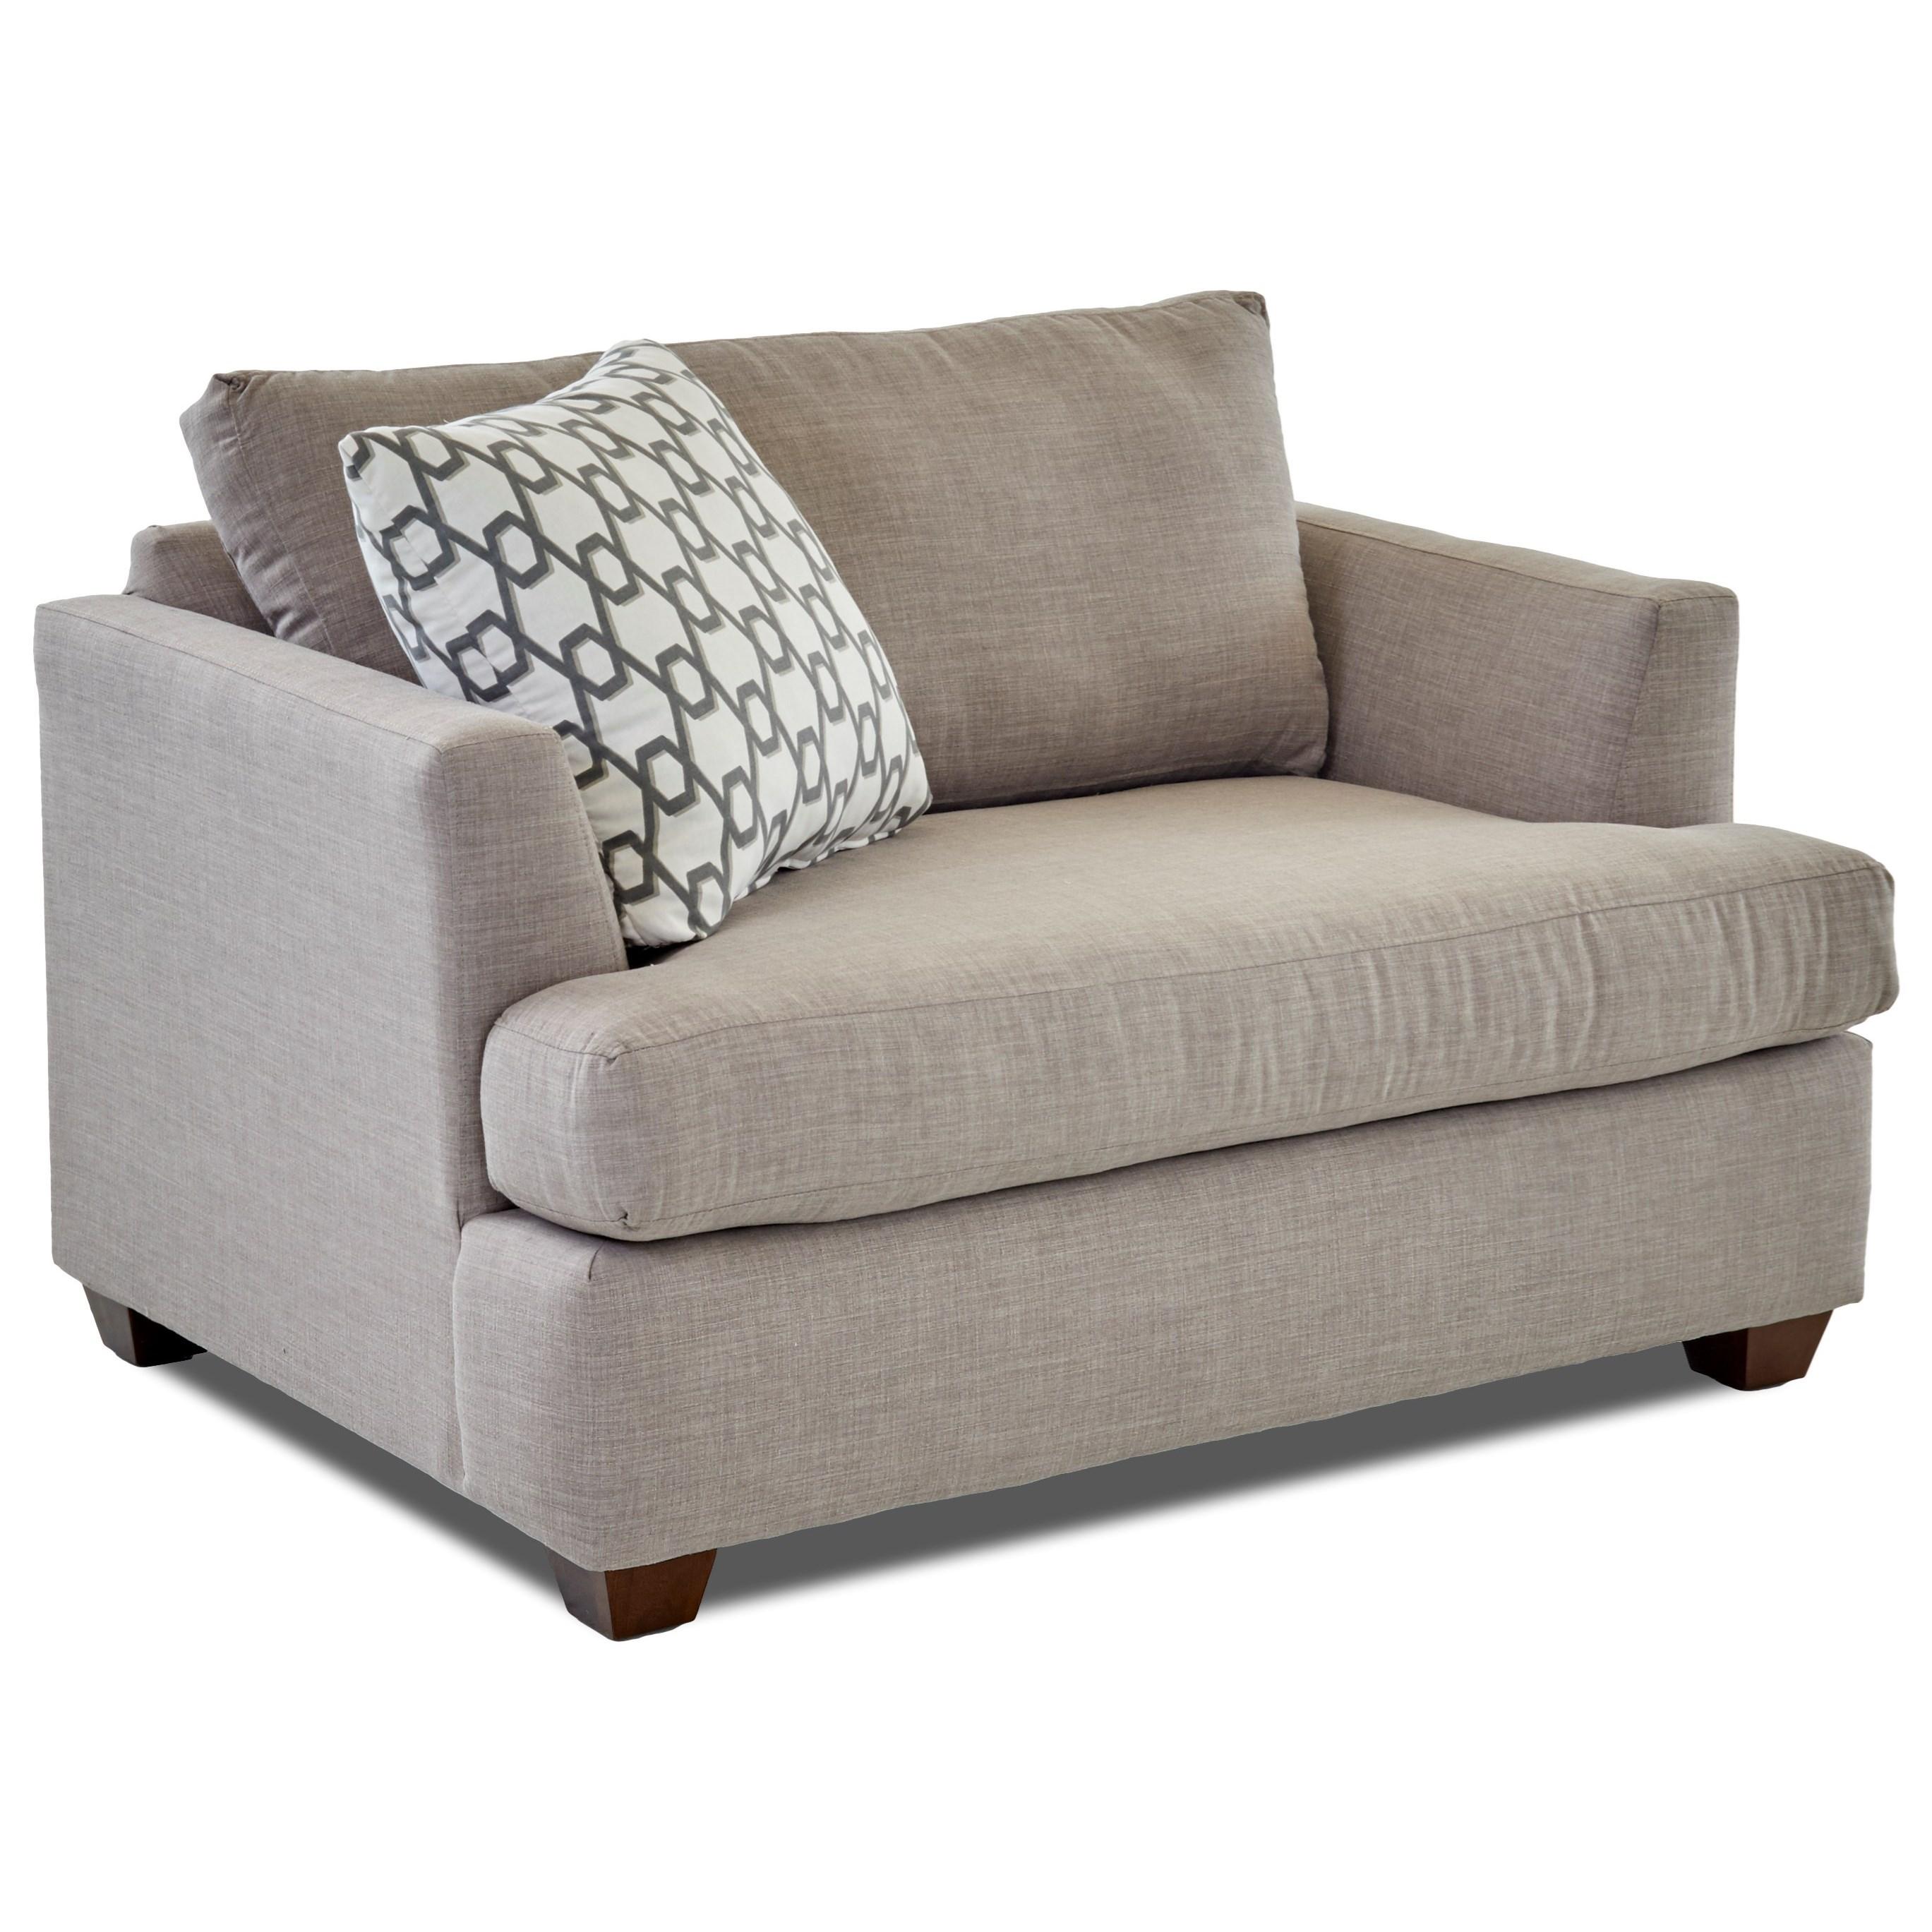 big chair with ottoman disney desk and storage bin klaussner jack set colder s furniture by